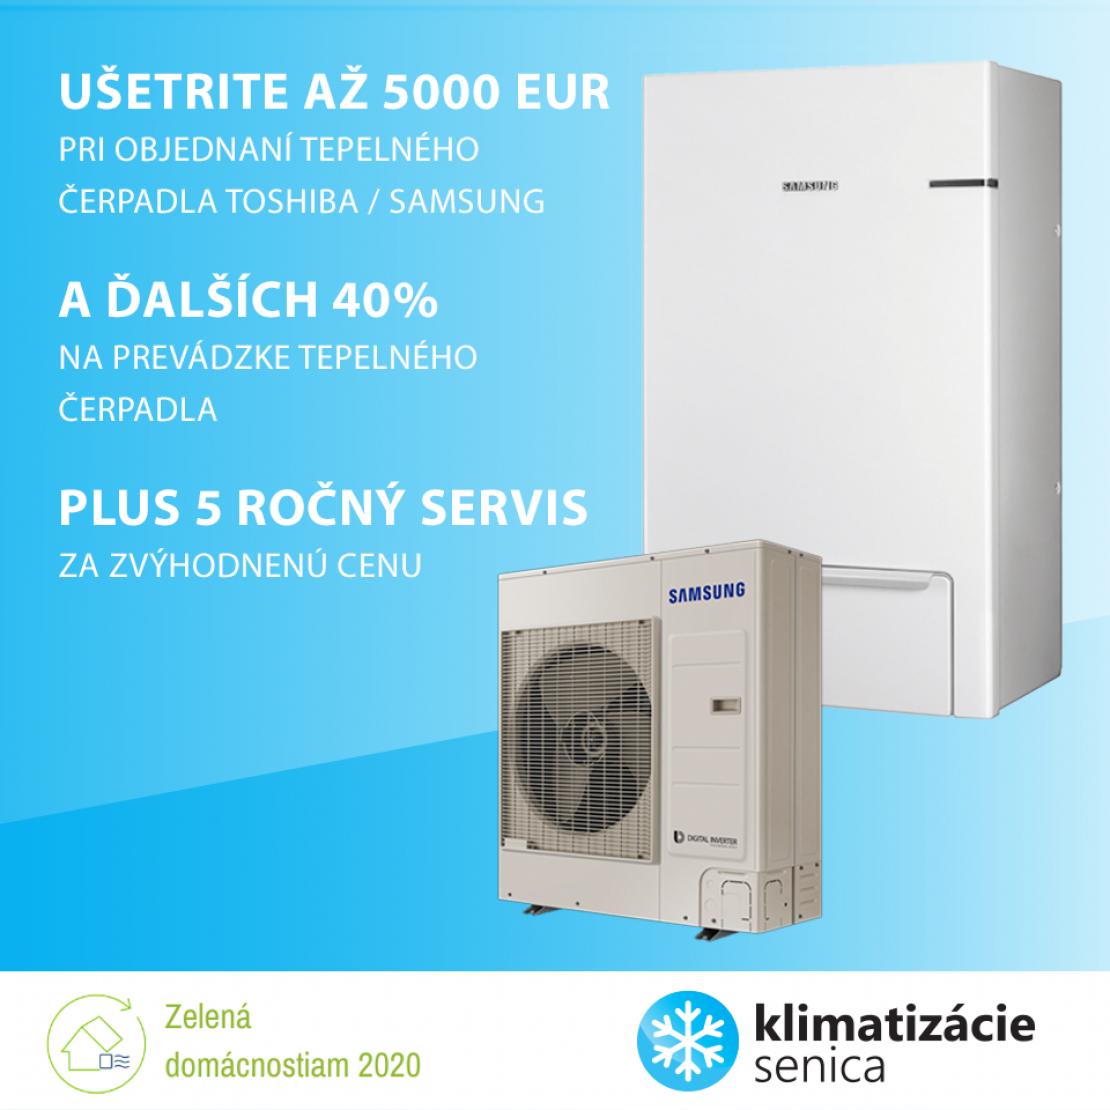 Zľava na tepelné čerpadlá do výšky až 5000 Eur.